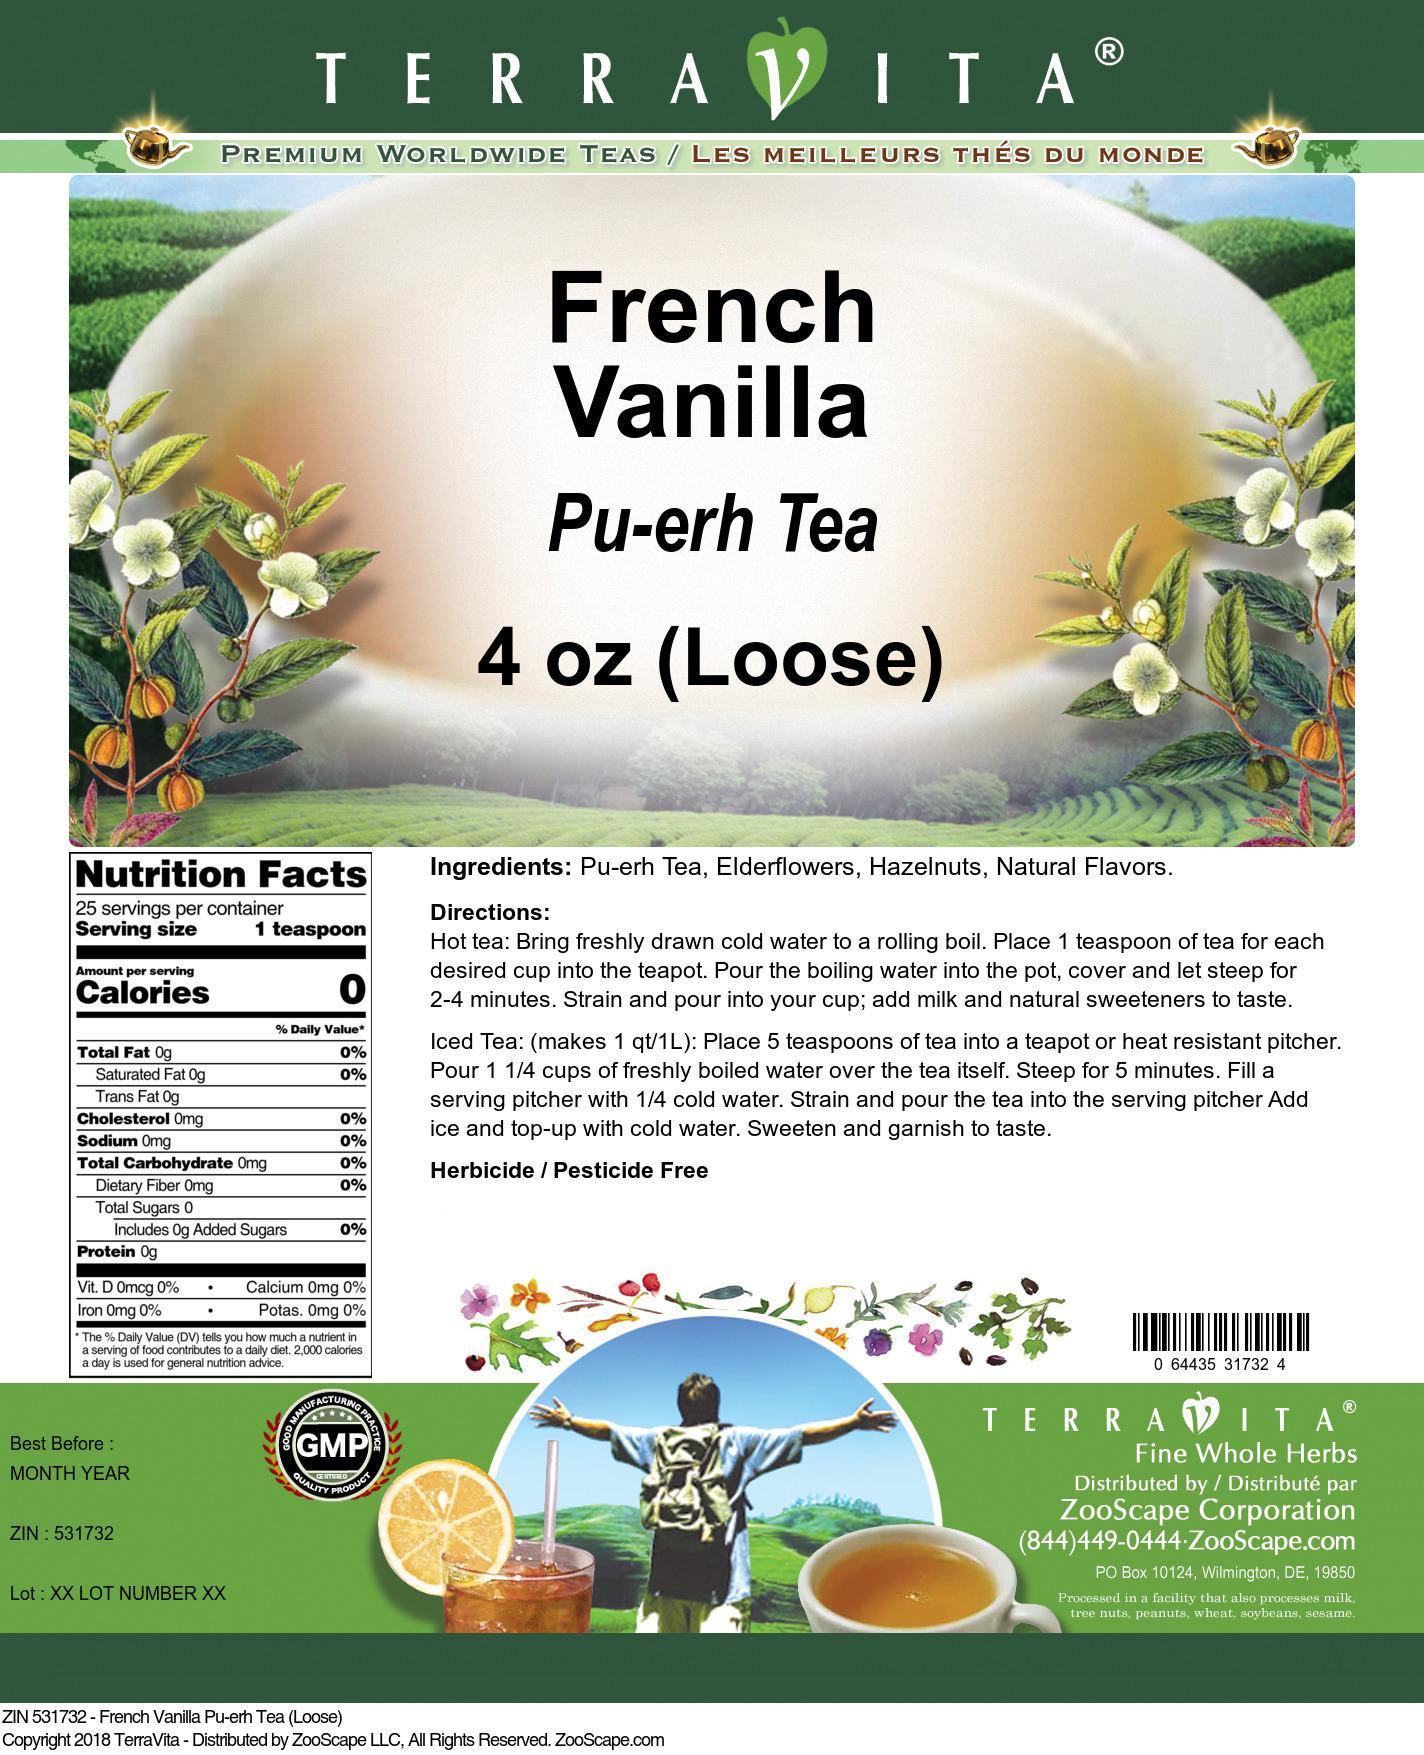 French Vanilla Pu-erh Tea (Loose)